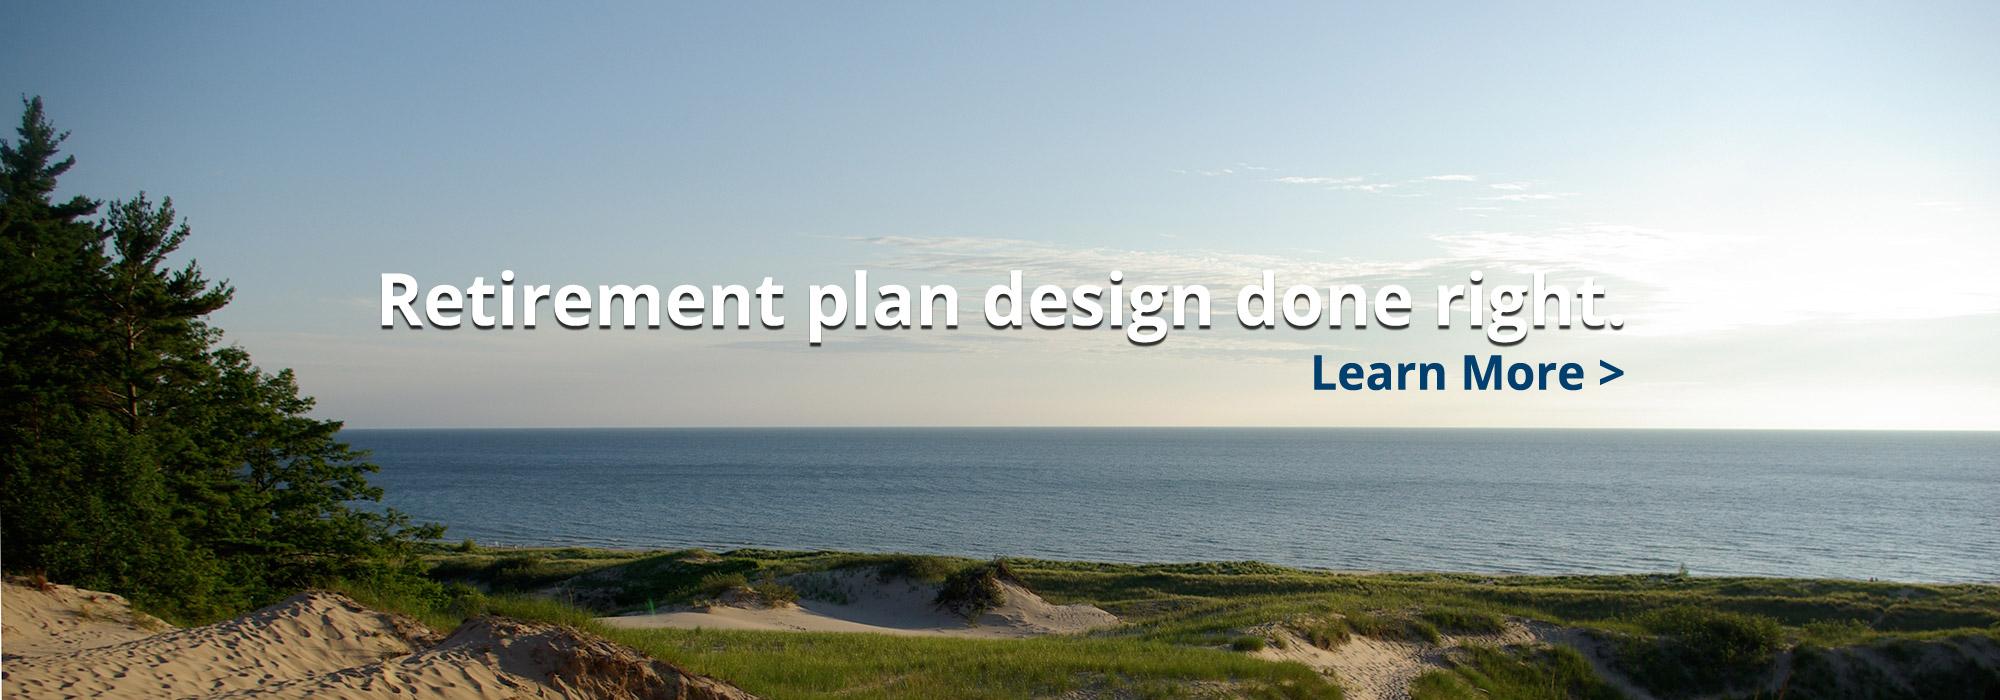 Retirement plan design done right